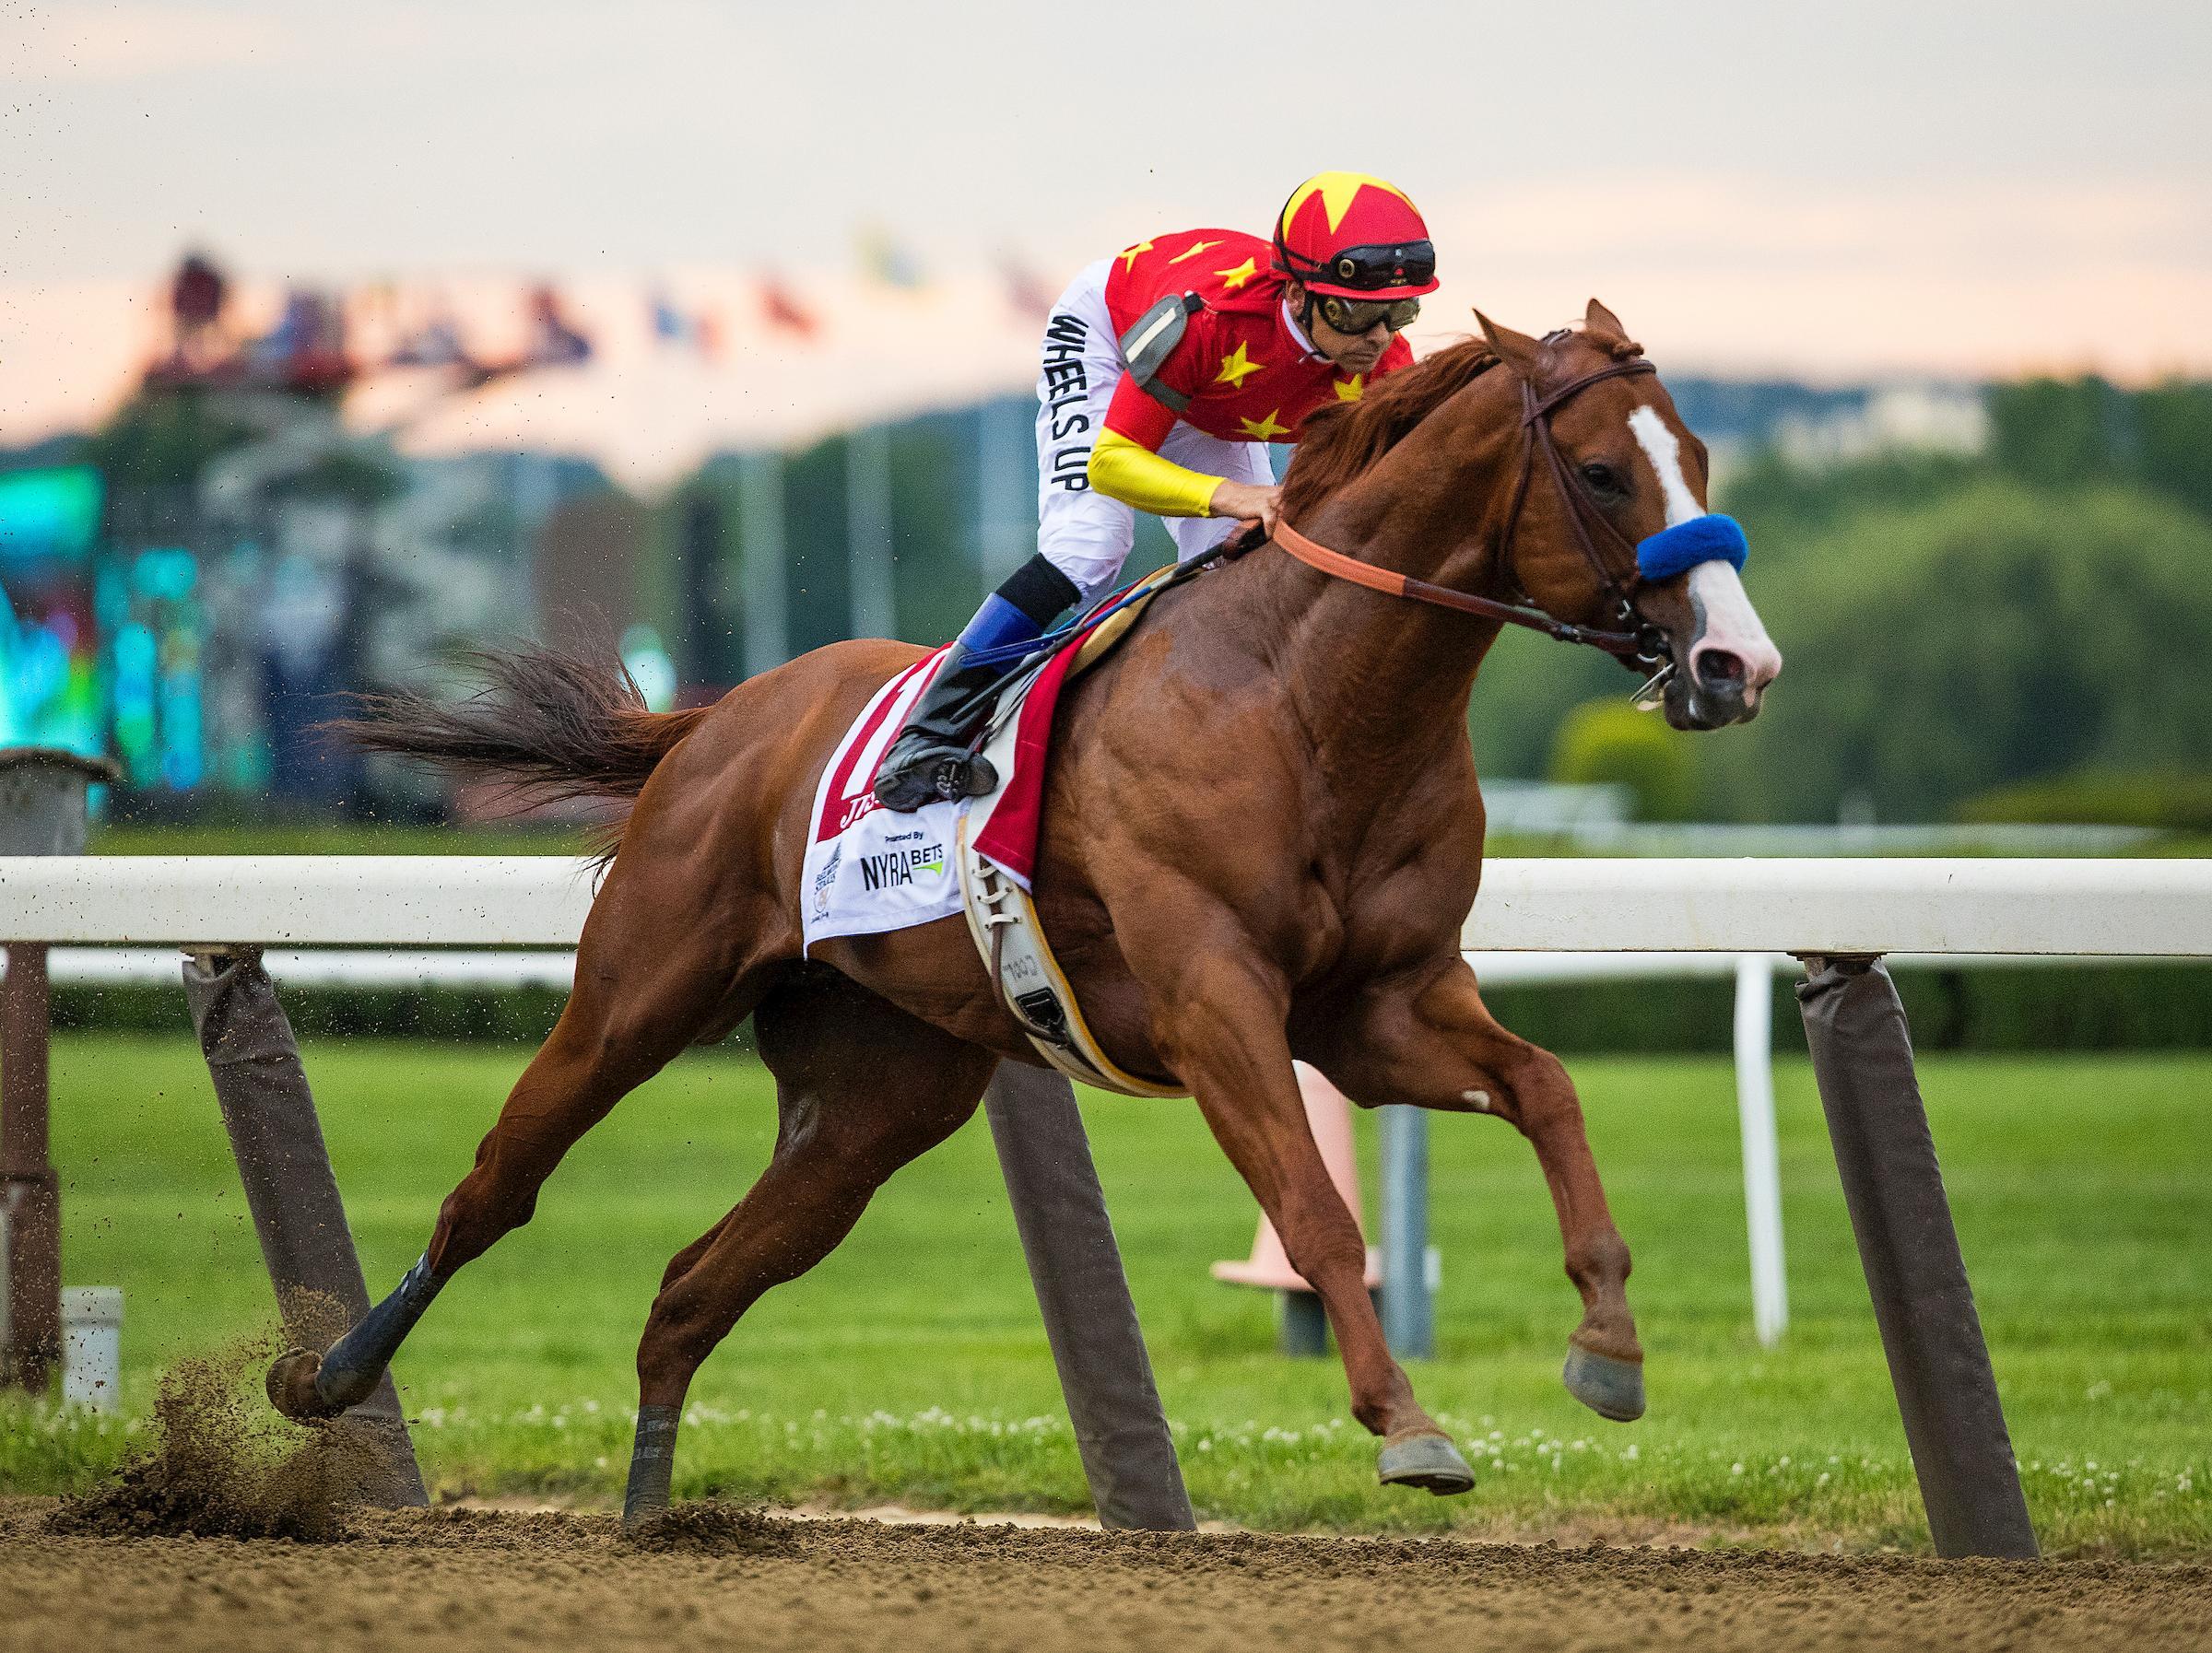 Horse racing betting questions godland bitcoins